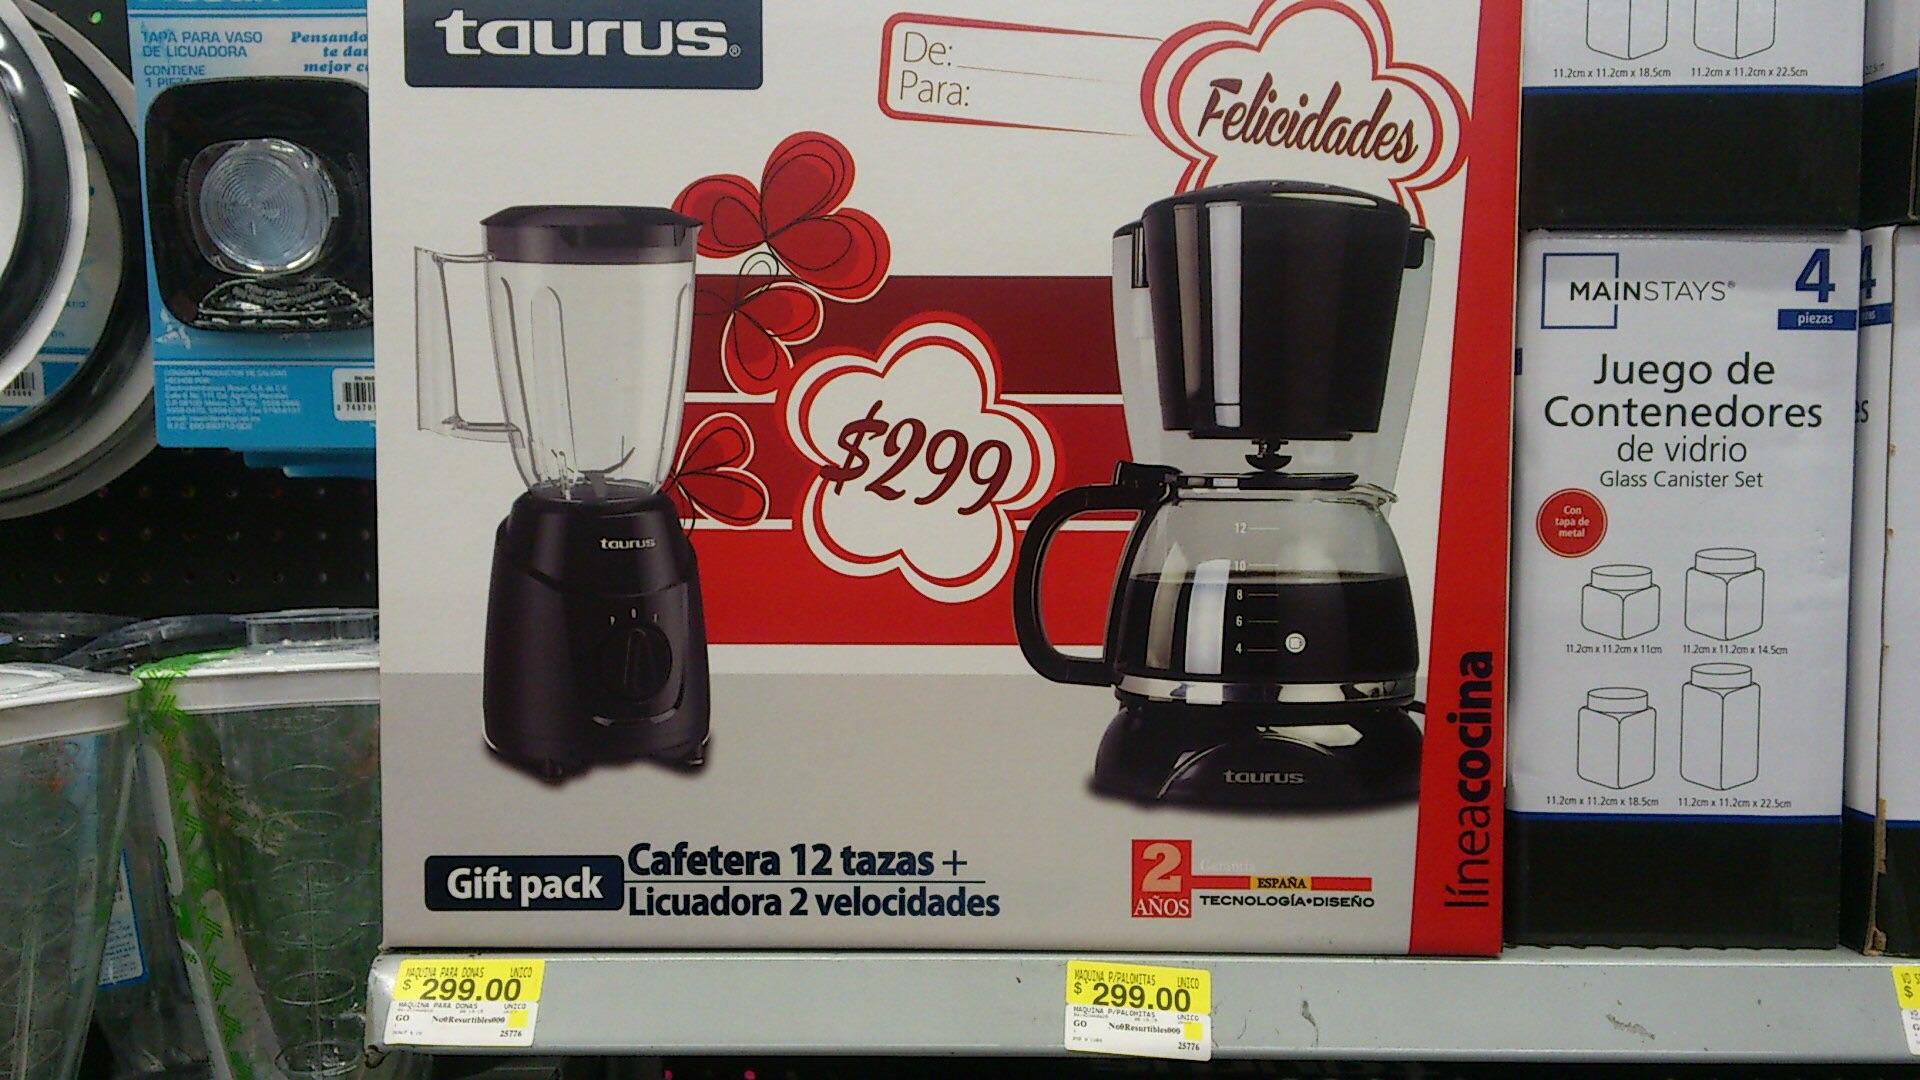 Bodega Aurrerá: Cafetera + licuadora Taurus $299